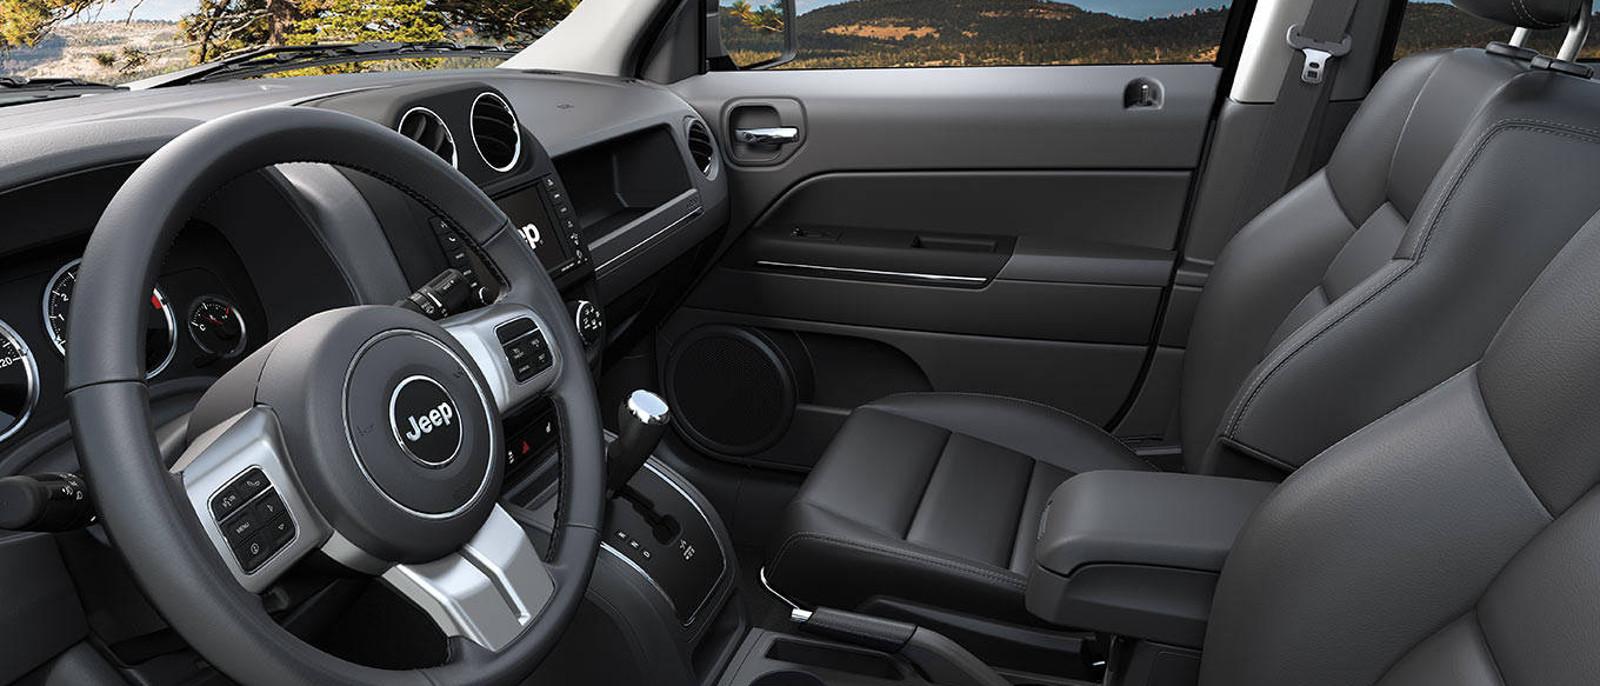 Dodge Dealership Saskatoon >> 2014 Jeep Patriot Medicine Hat Swift Current | Jackson Dodge